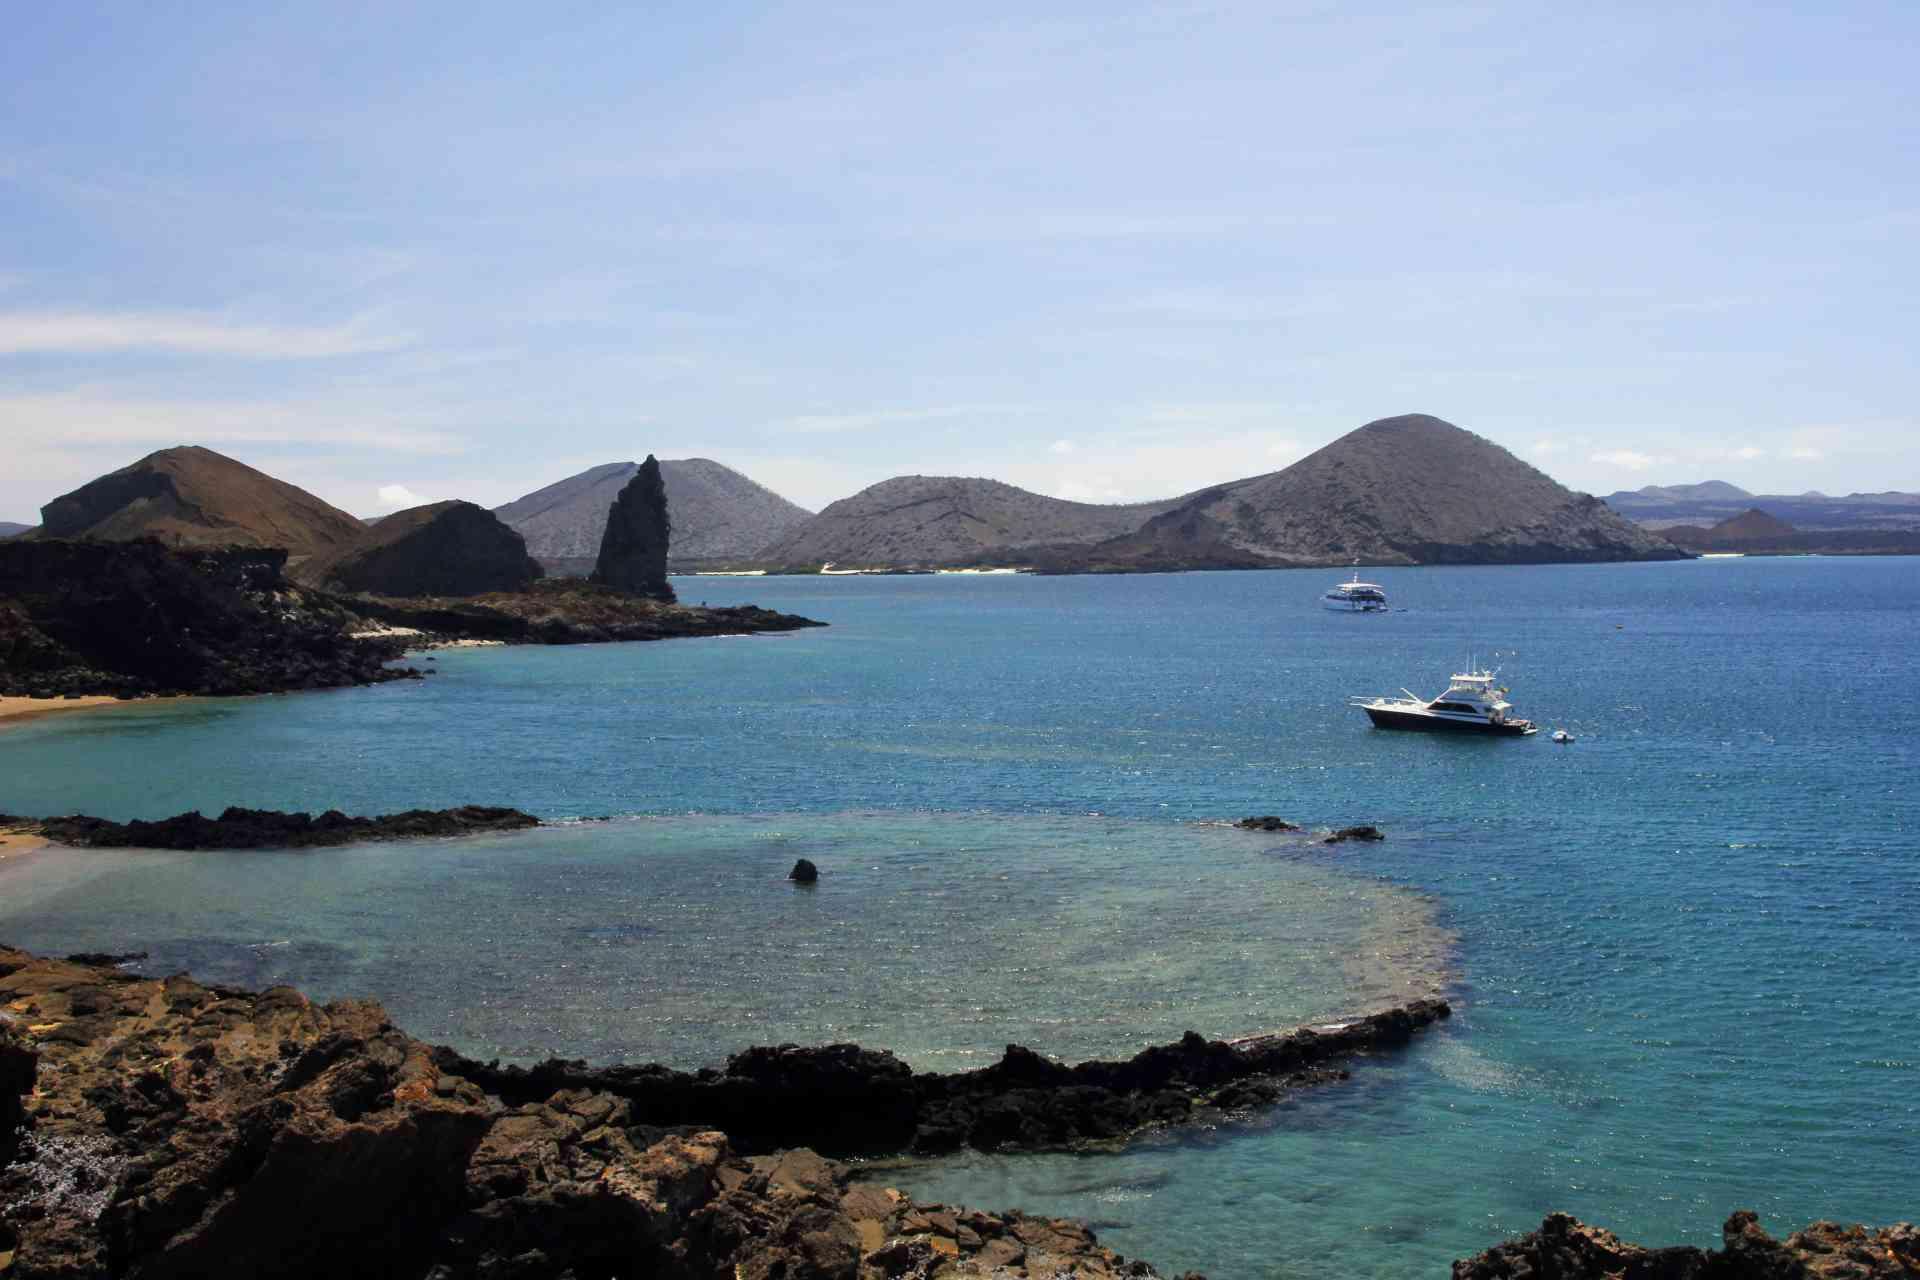 Views of the Galapagos Islands, Ecuador by David Hammett